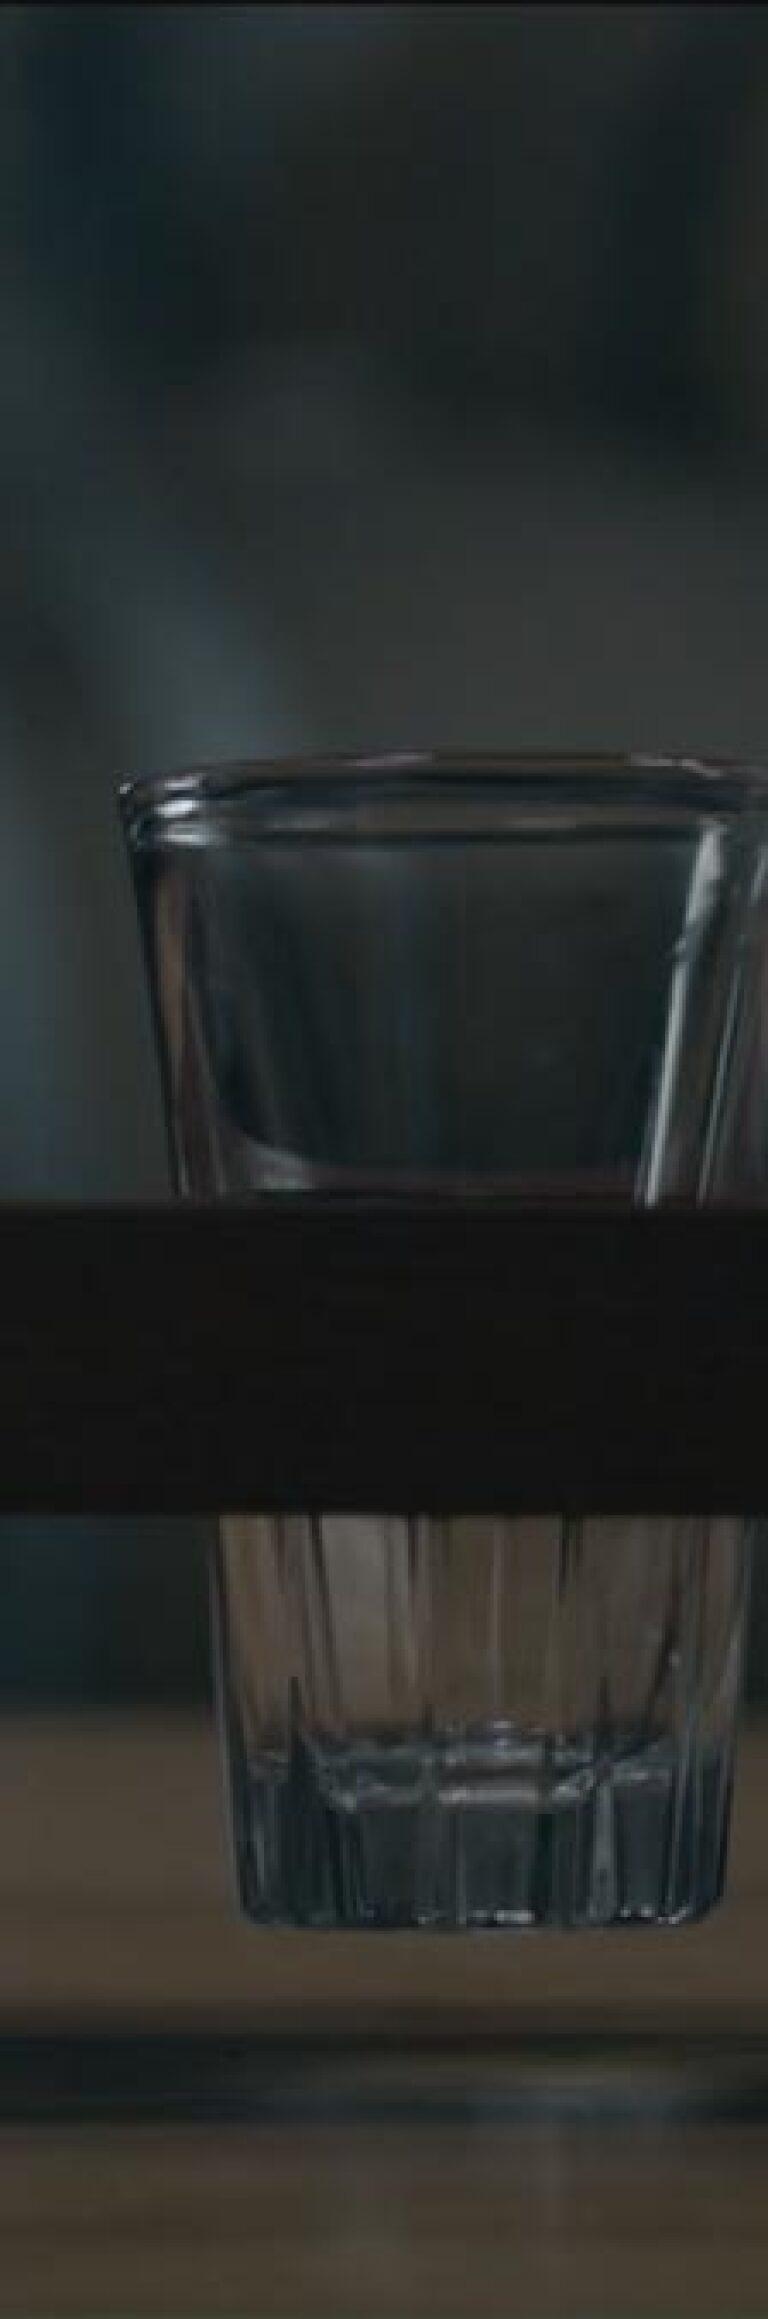 "Three Sequoia sake glasses | Still from ""The Migrant Kitchen"" Sequoia Sake"